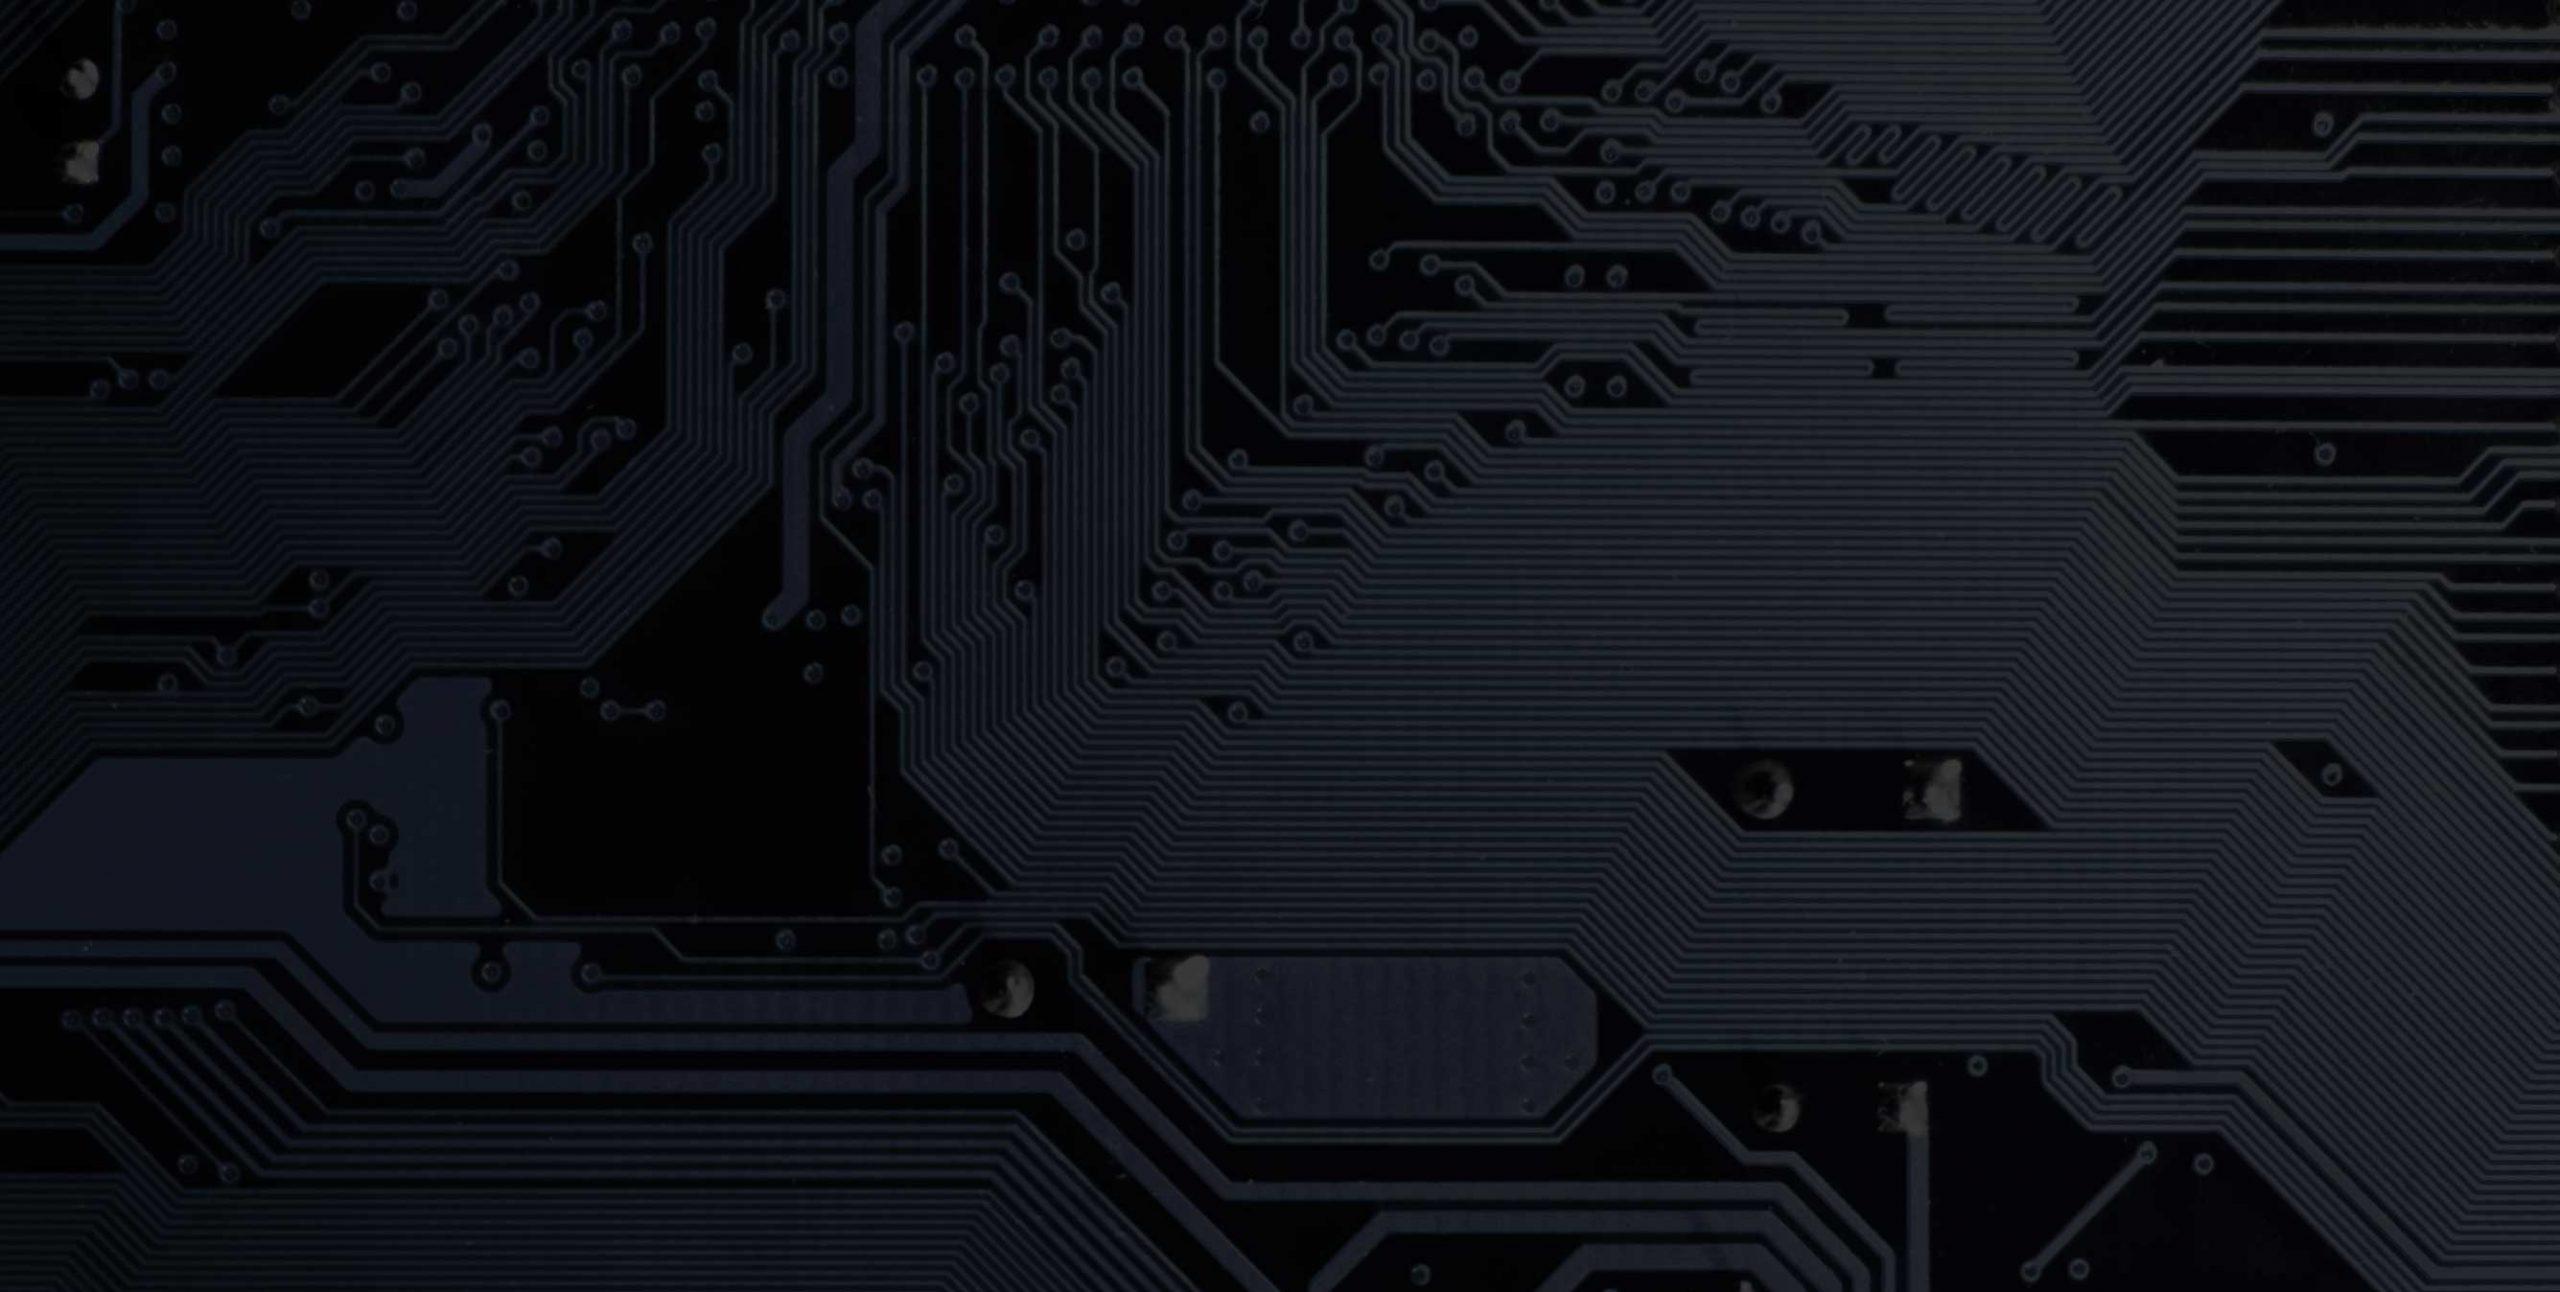 dark image of a circuit board